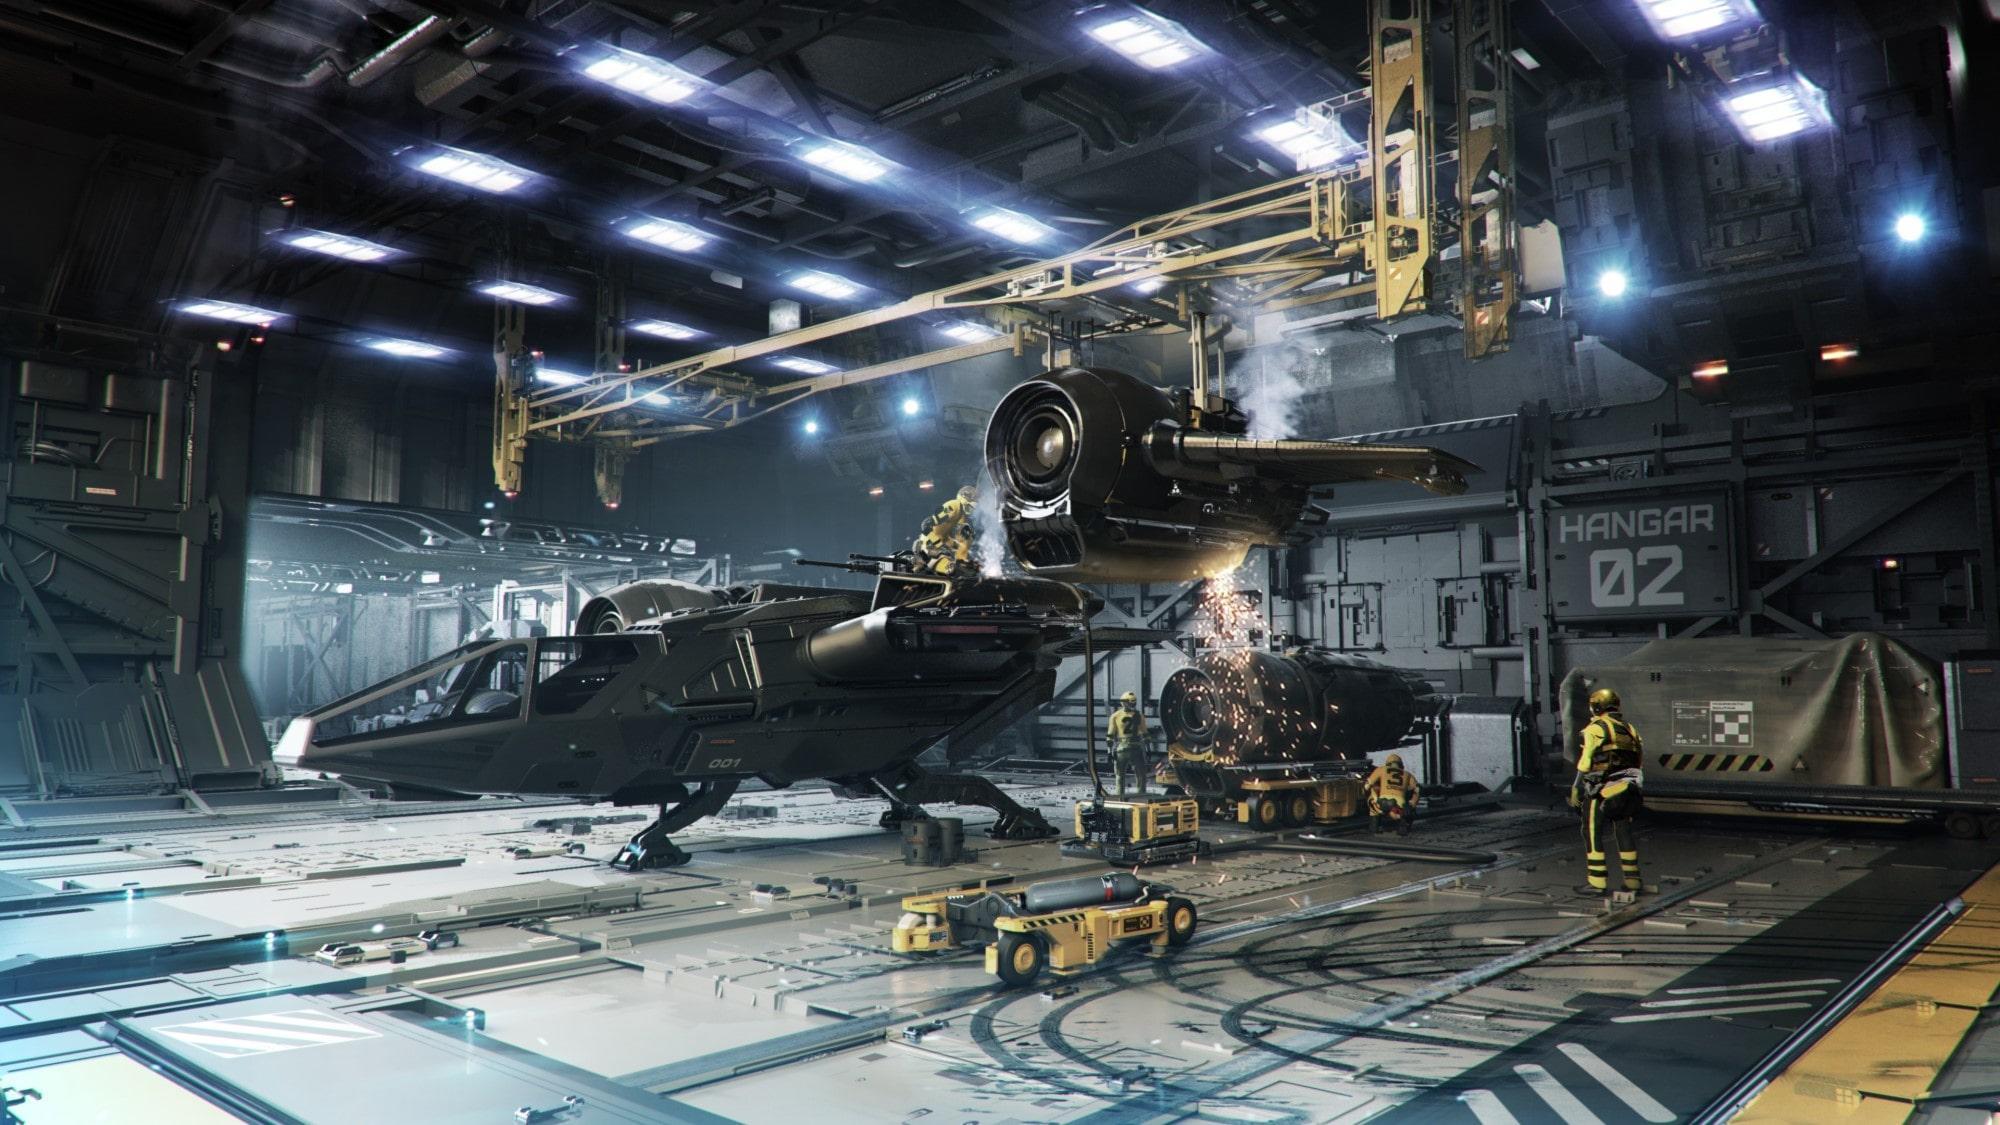 Kraken - hangar